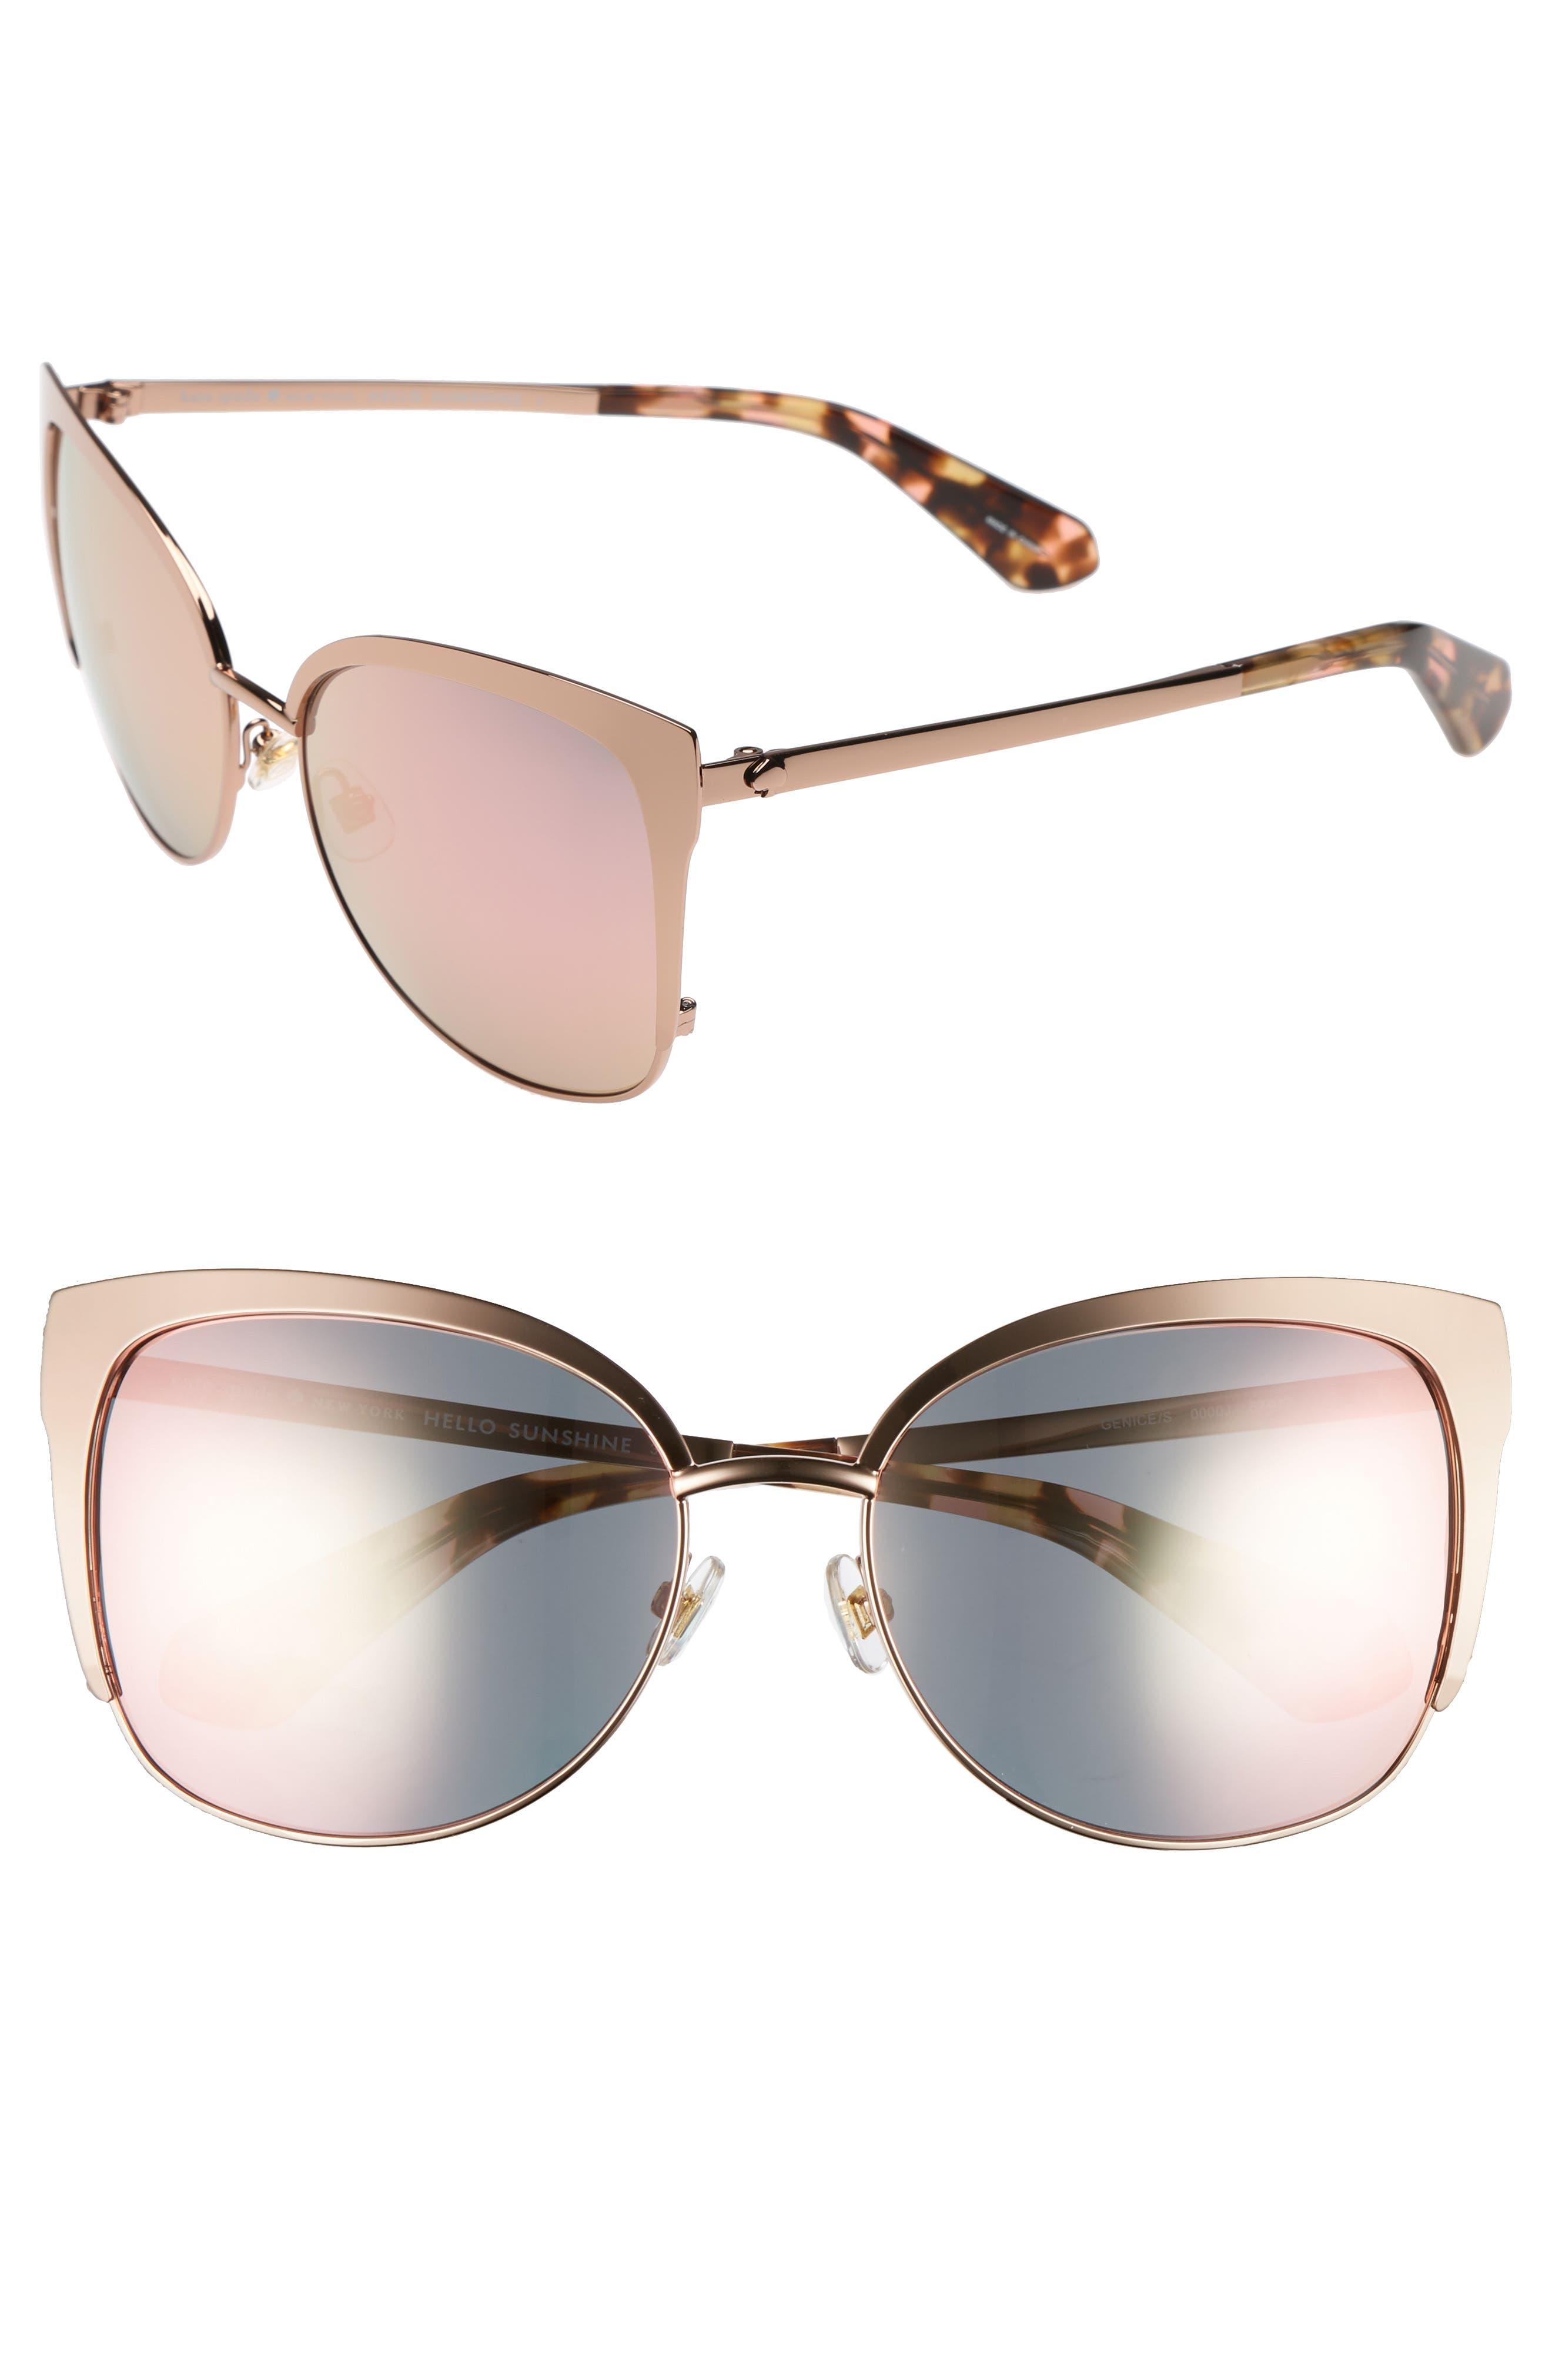 KATE SPADE NEW YORK, 'genice' 57mm cat-eye sunglasses, Main thumbnail 1, color, 710